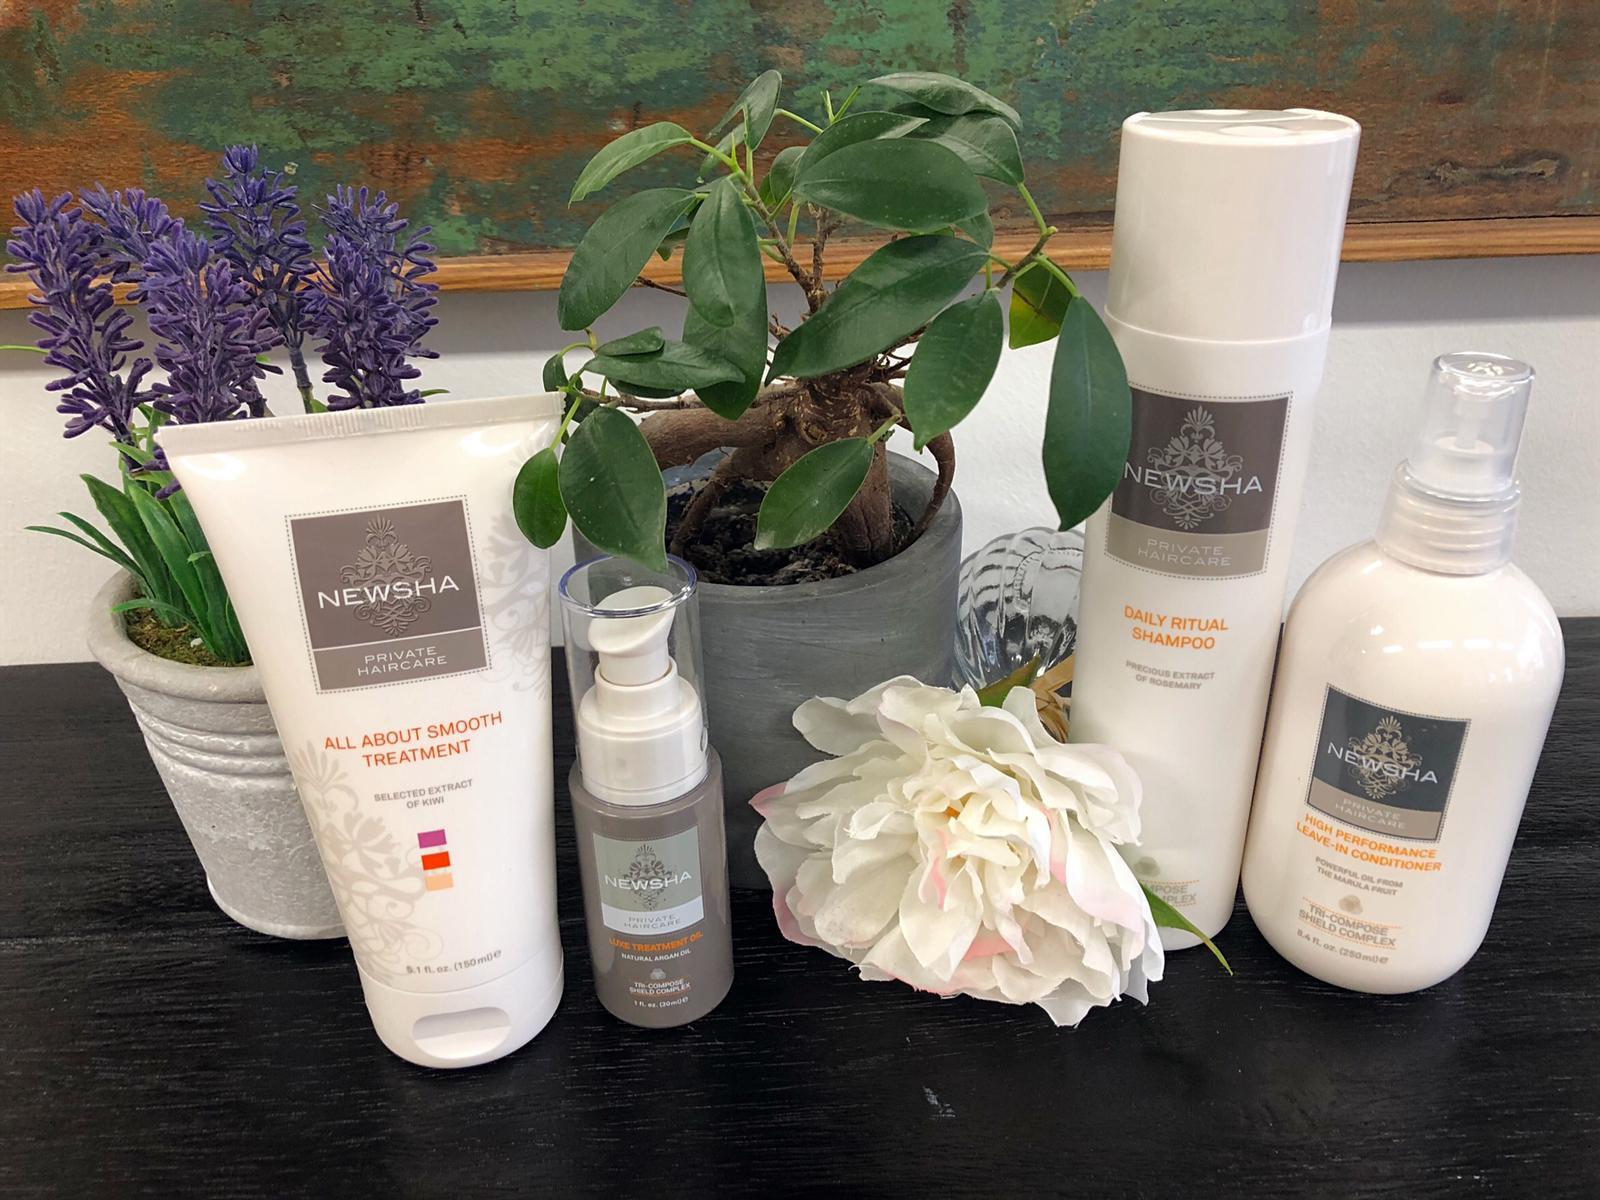 Newsha-NEWSHA Daily Ritual Shampoo-NEWSHA High Performance Leave-In Conditioner-NEWSHA All About Smooth Treatment-NEWSHA Luxe Treatment Oil